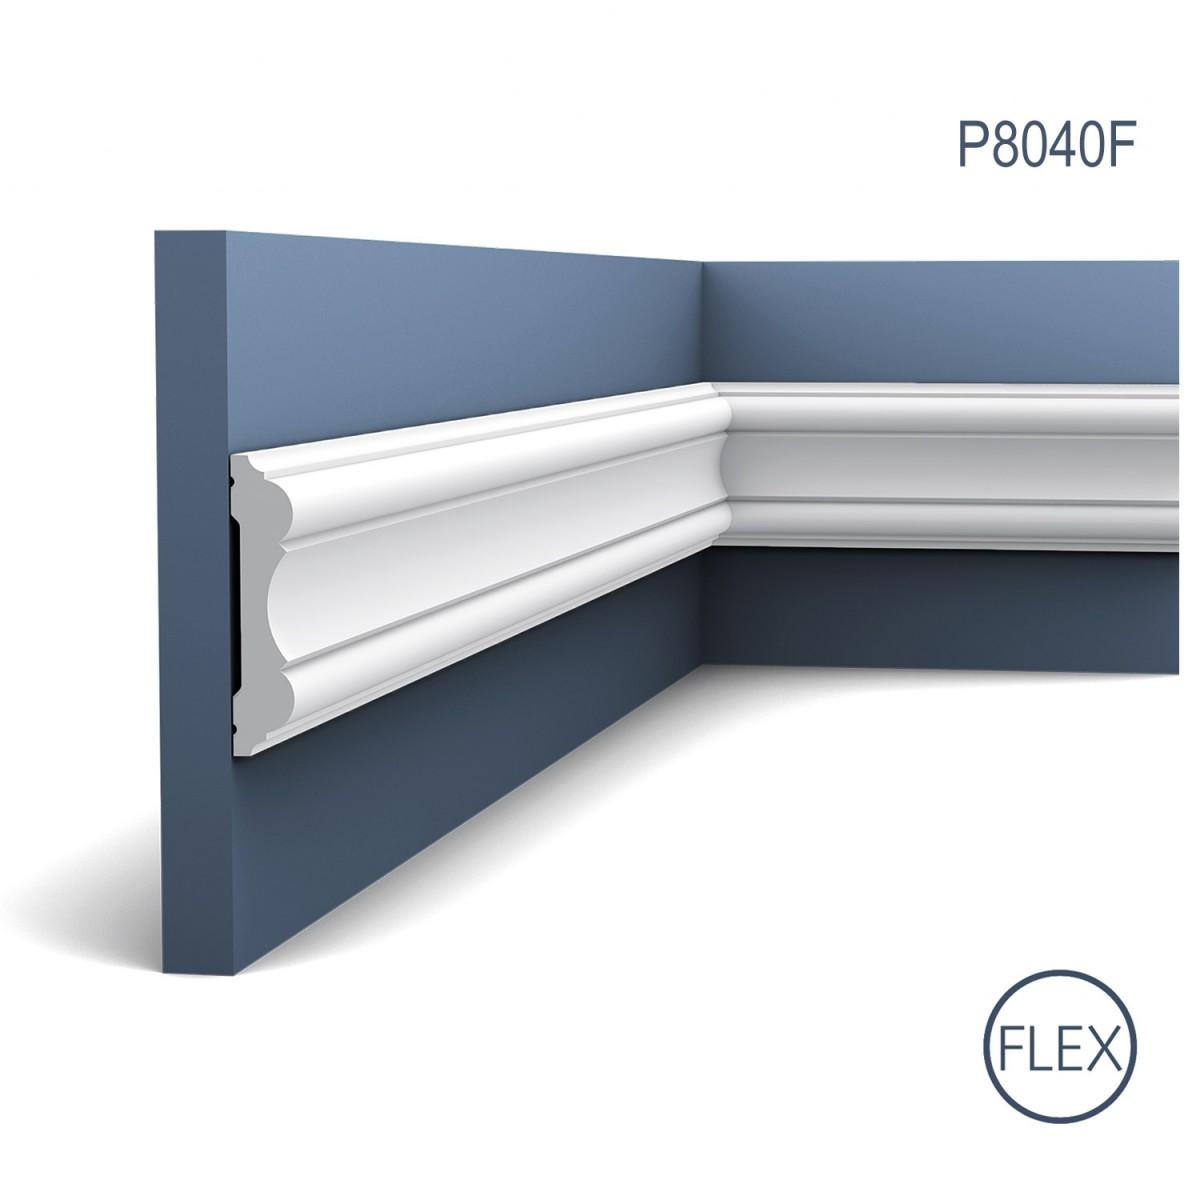 Brau Flex Luxxus P8040F, Dimensiuni: 200 X 10.1 X 2.2 cm, Orac Decor